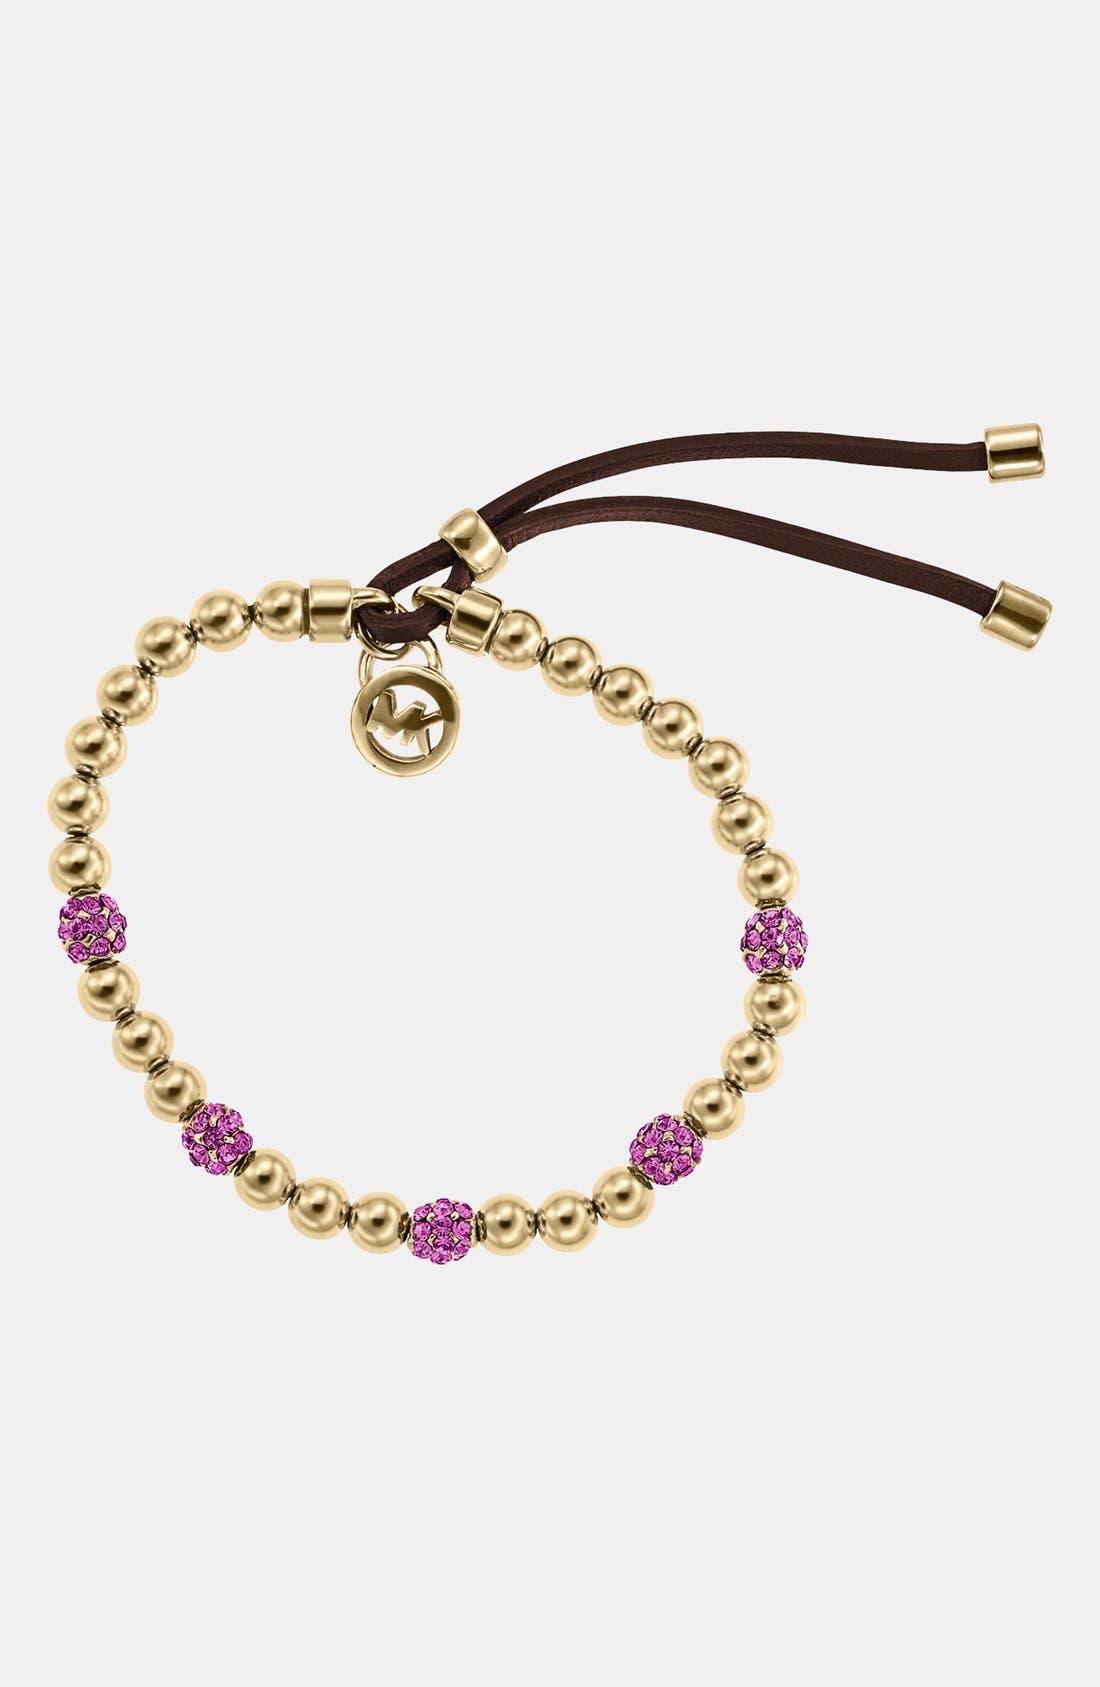 Alternate Image 1 Selected - Michael Kors Bead & Crystal Stretch Bracelet